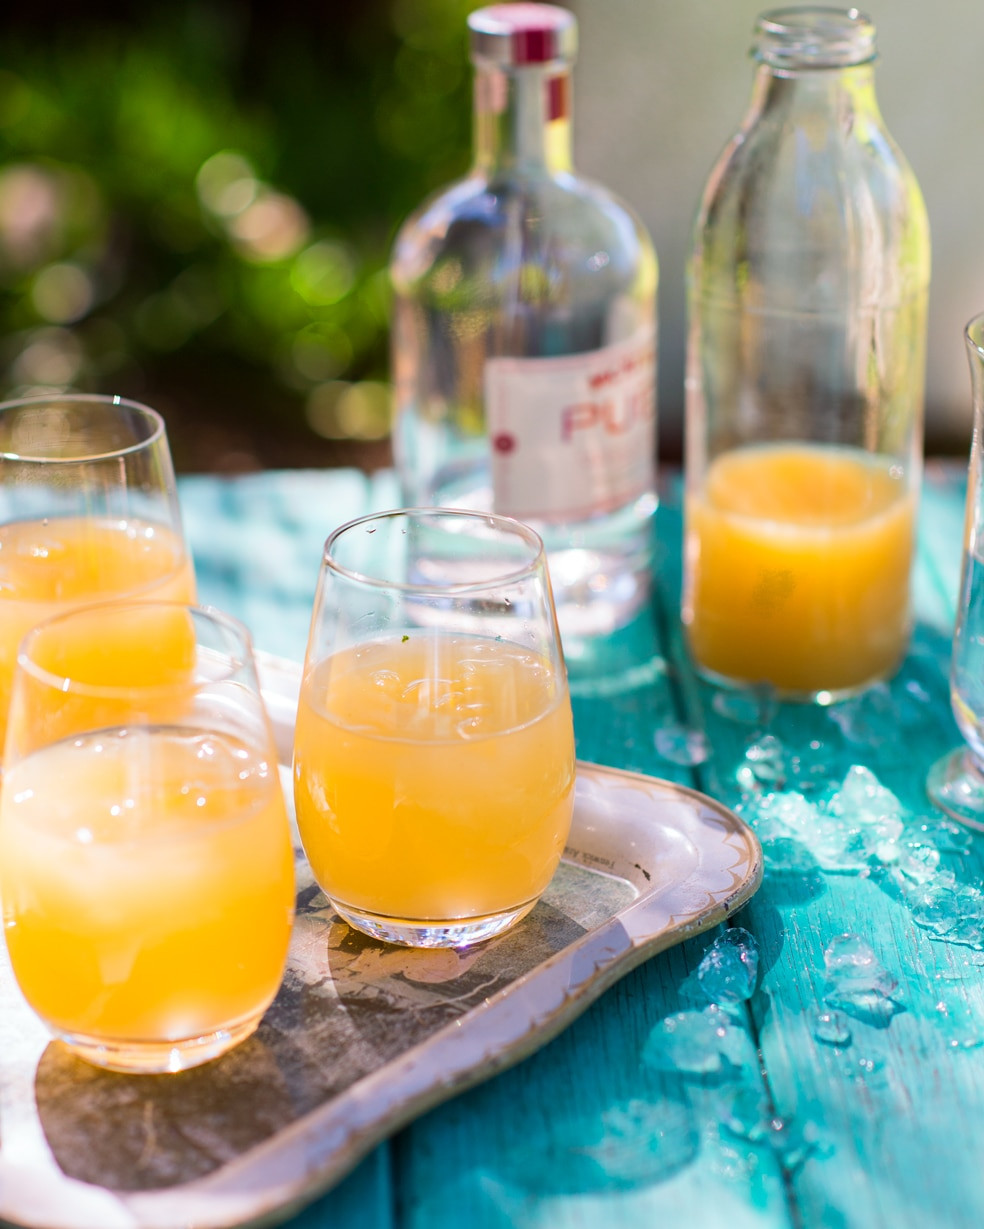 Apple Vodka Drinks  Sparkling apple vodka drinks recipe SBS Food